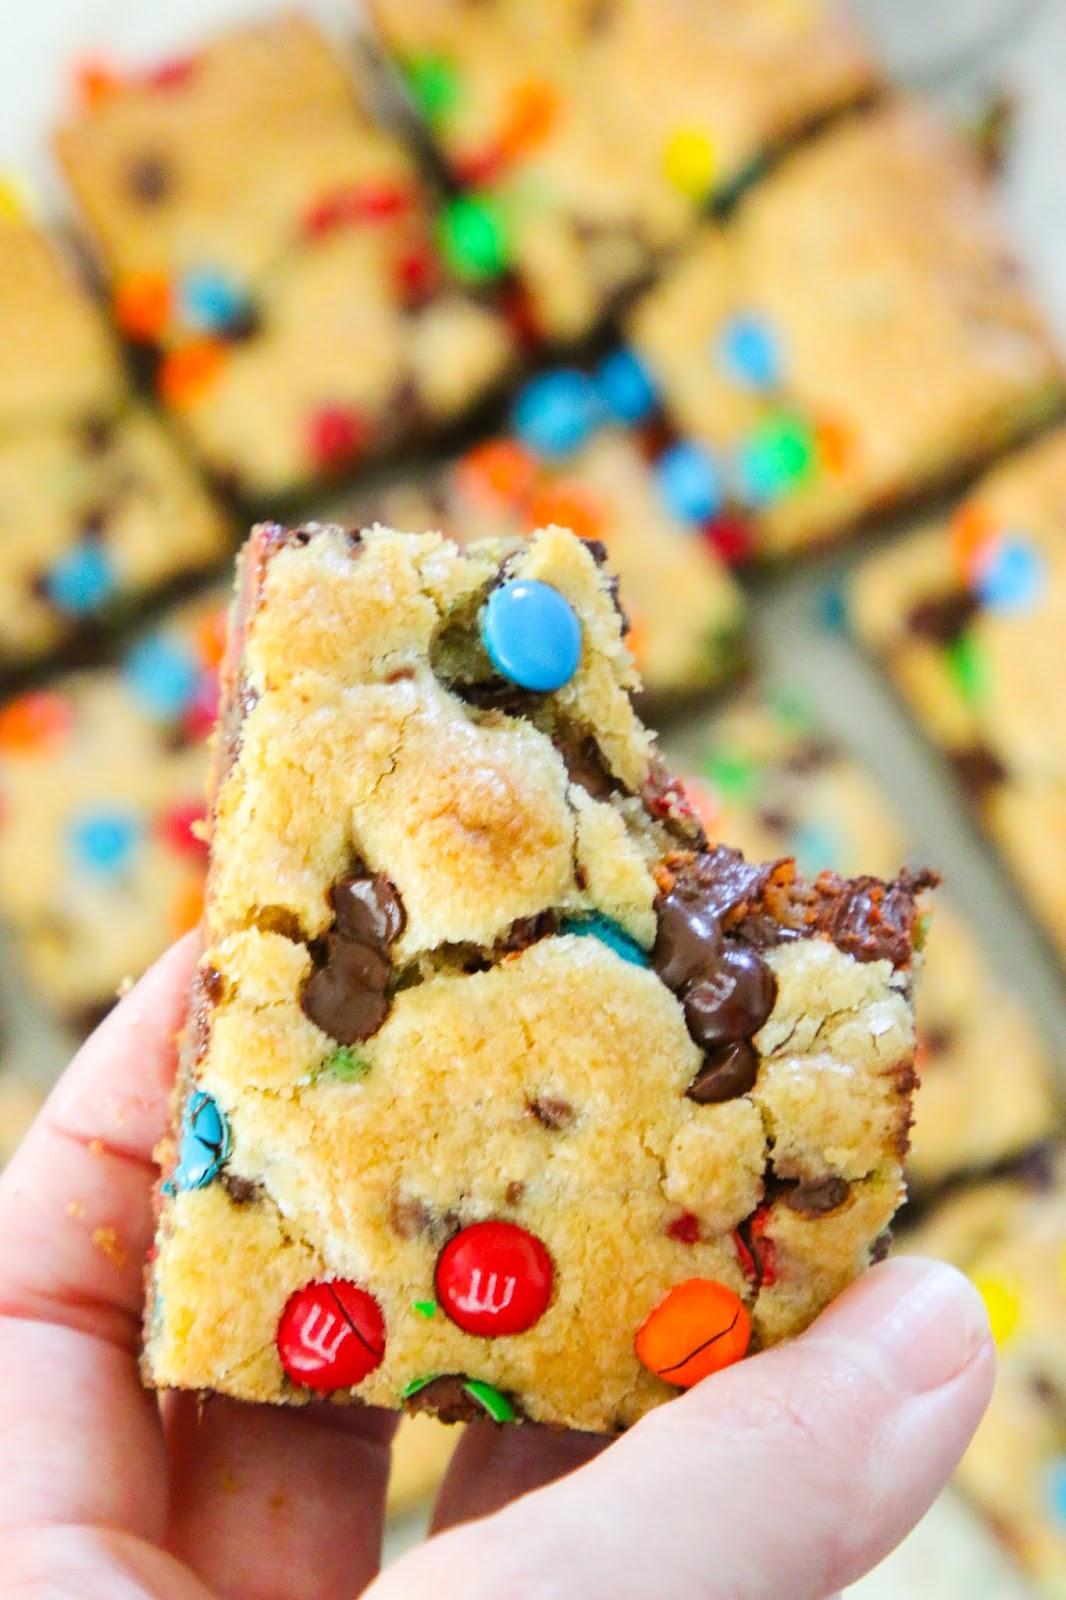 m&m chocolate chip blondes. M&M bars. Blondies recipe. Rainbow blondies. M&M brownies. Brown butter m&m blondies. M&M cookie recipes. The best m&m dessert recipes. Easy family night recipes. The best cookie bar recipe. Cookie bar recipes. The best cookie cake recipe. #cookies #chocolate #baking #cookiecake #cookiebars